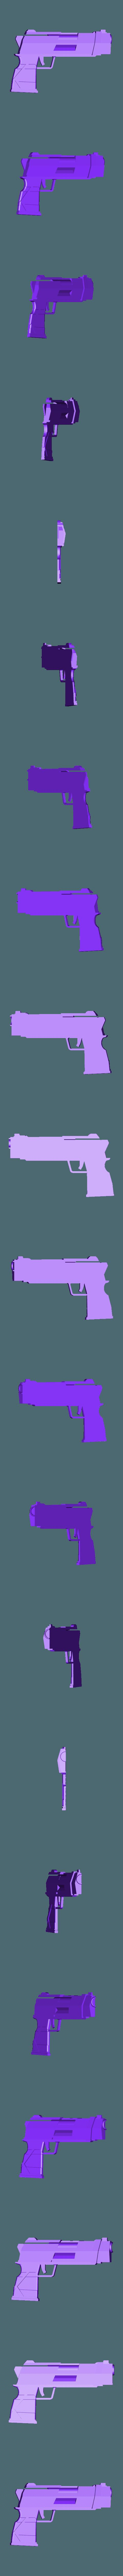 raz2.stl Download STL file Gun for a cosplay • 3D printer model, URkA